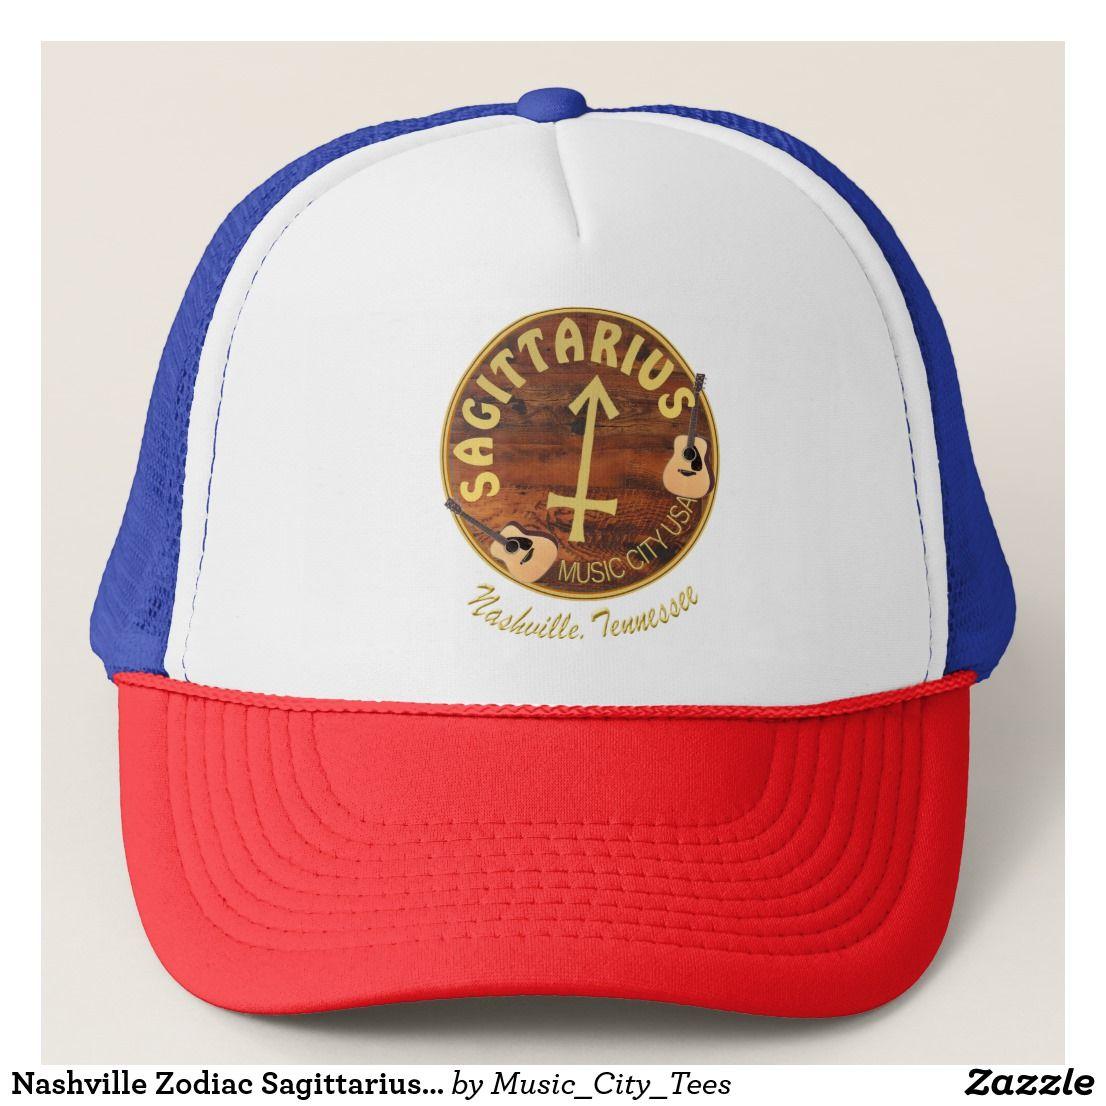 cheap for discount 3ebbb 38138 Nashville Zodiac Sagittarius Trucker Hat A Nashville Sagittarius design for  truckers  hats, baseball caps and other custom Music City USA items to show  off ...